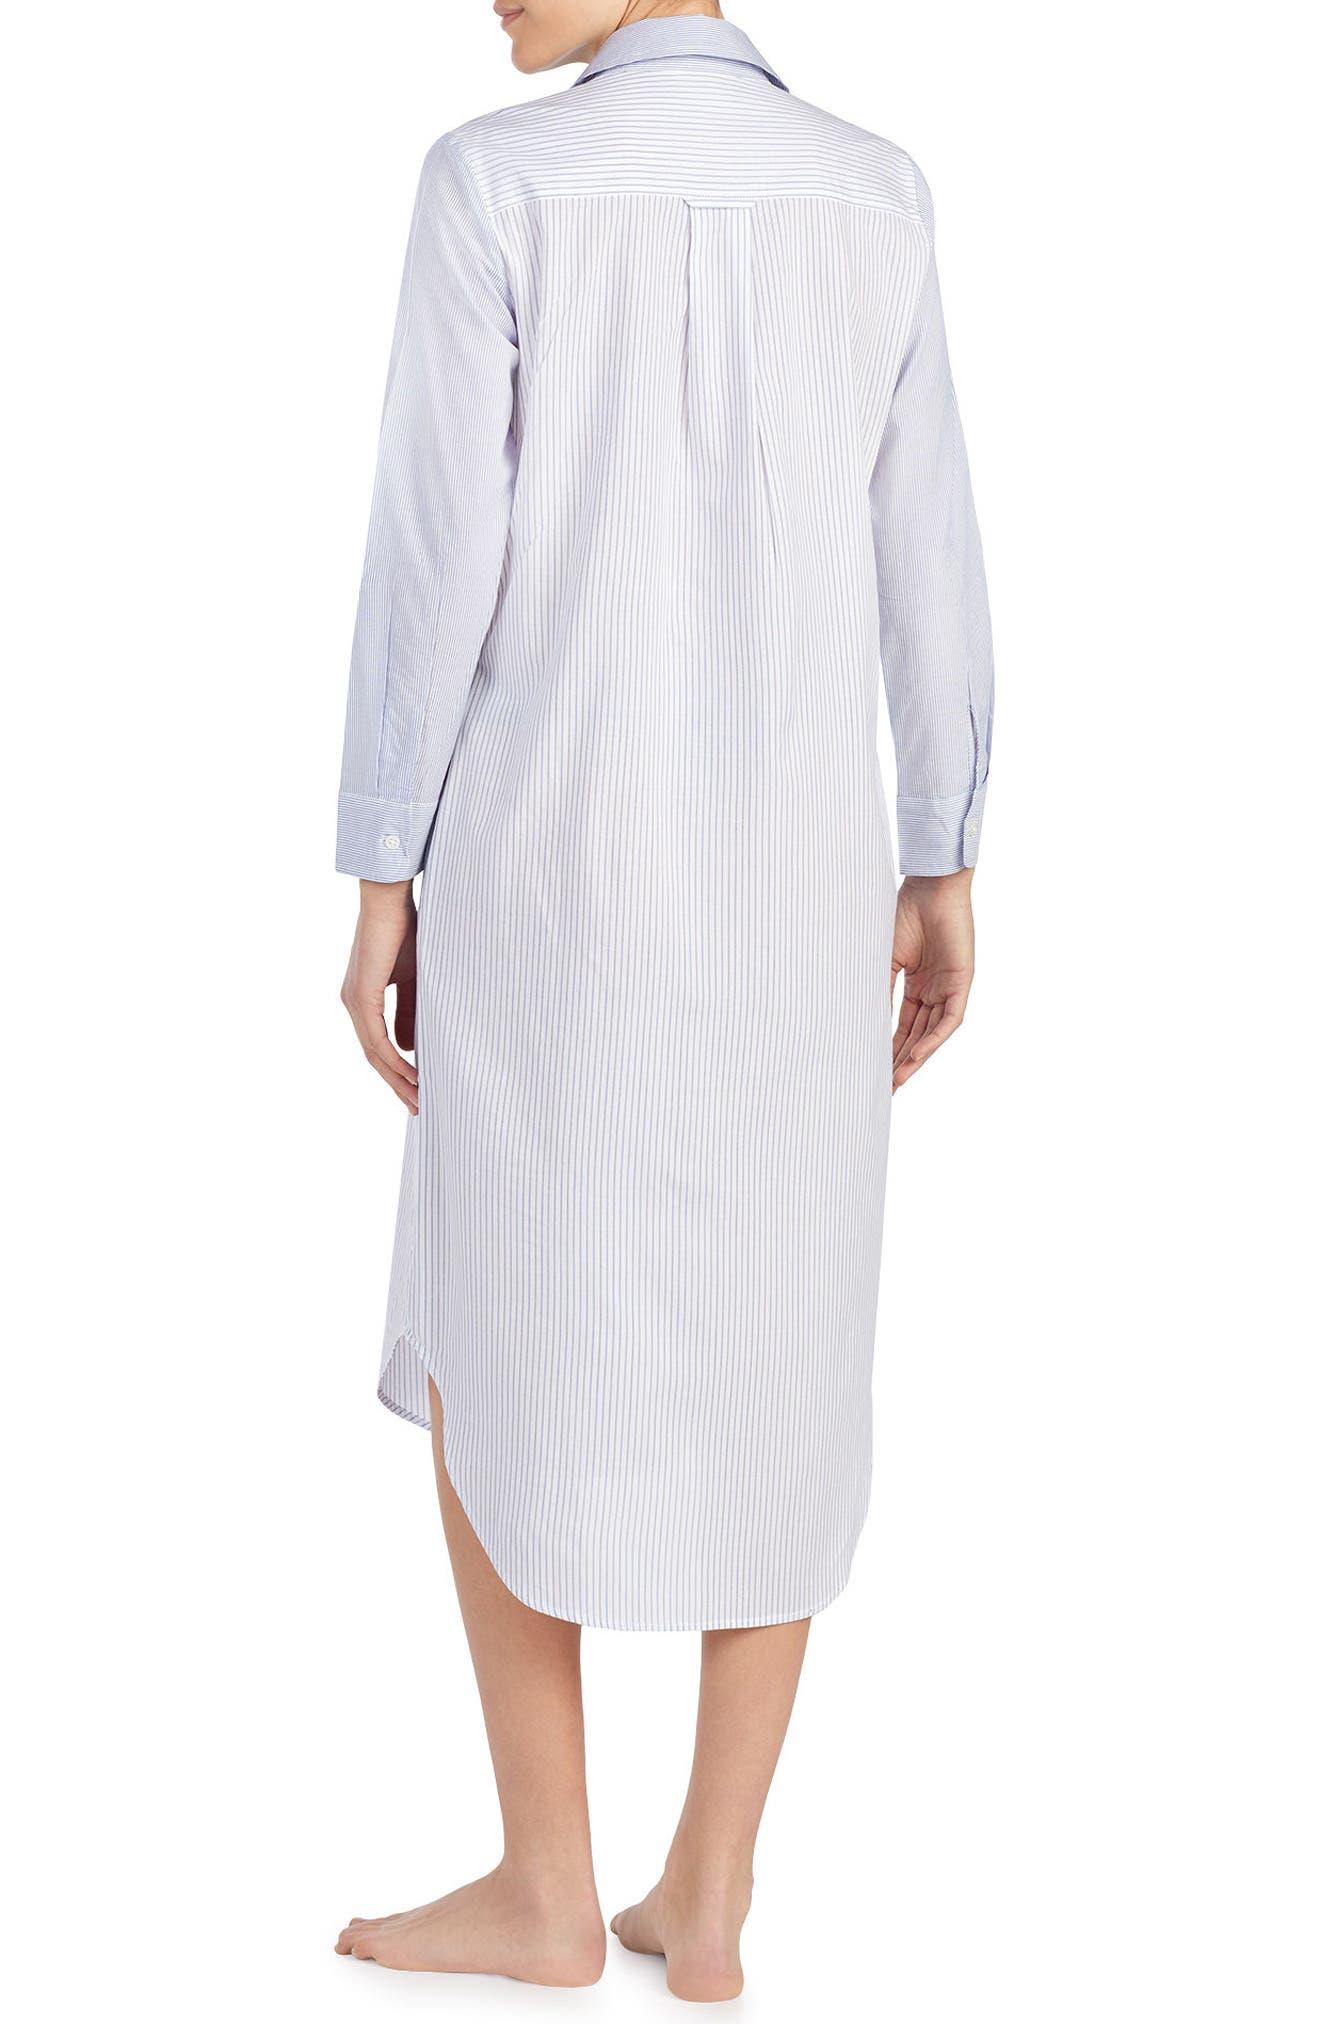 Sleep Shirt,                             Alternate thumbnail 2, color,                             WHITE STRIPE